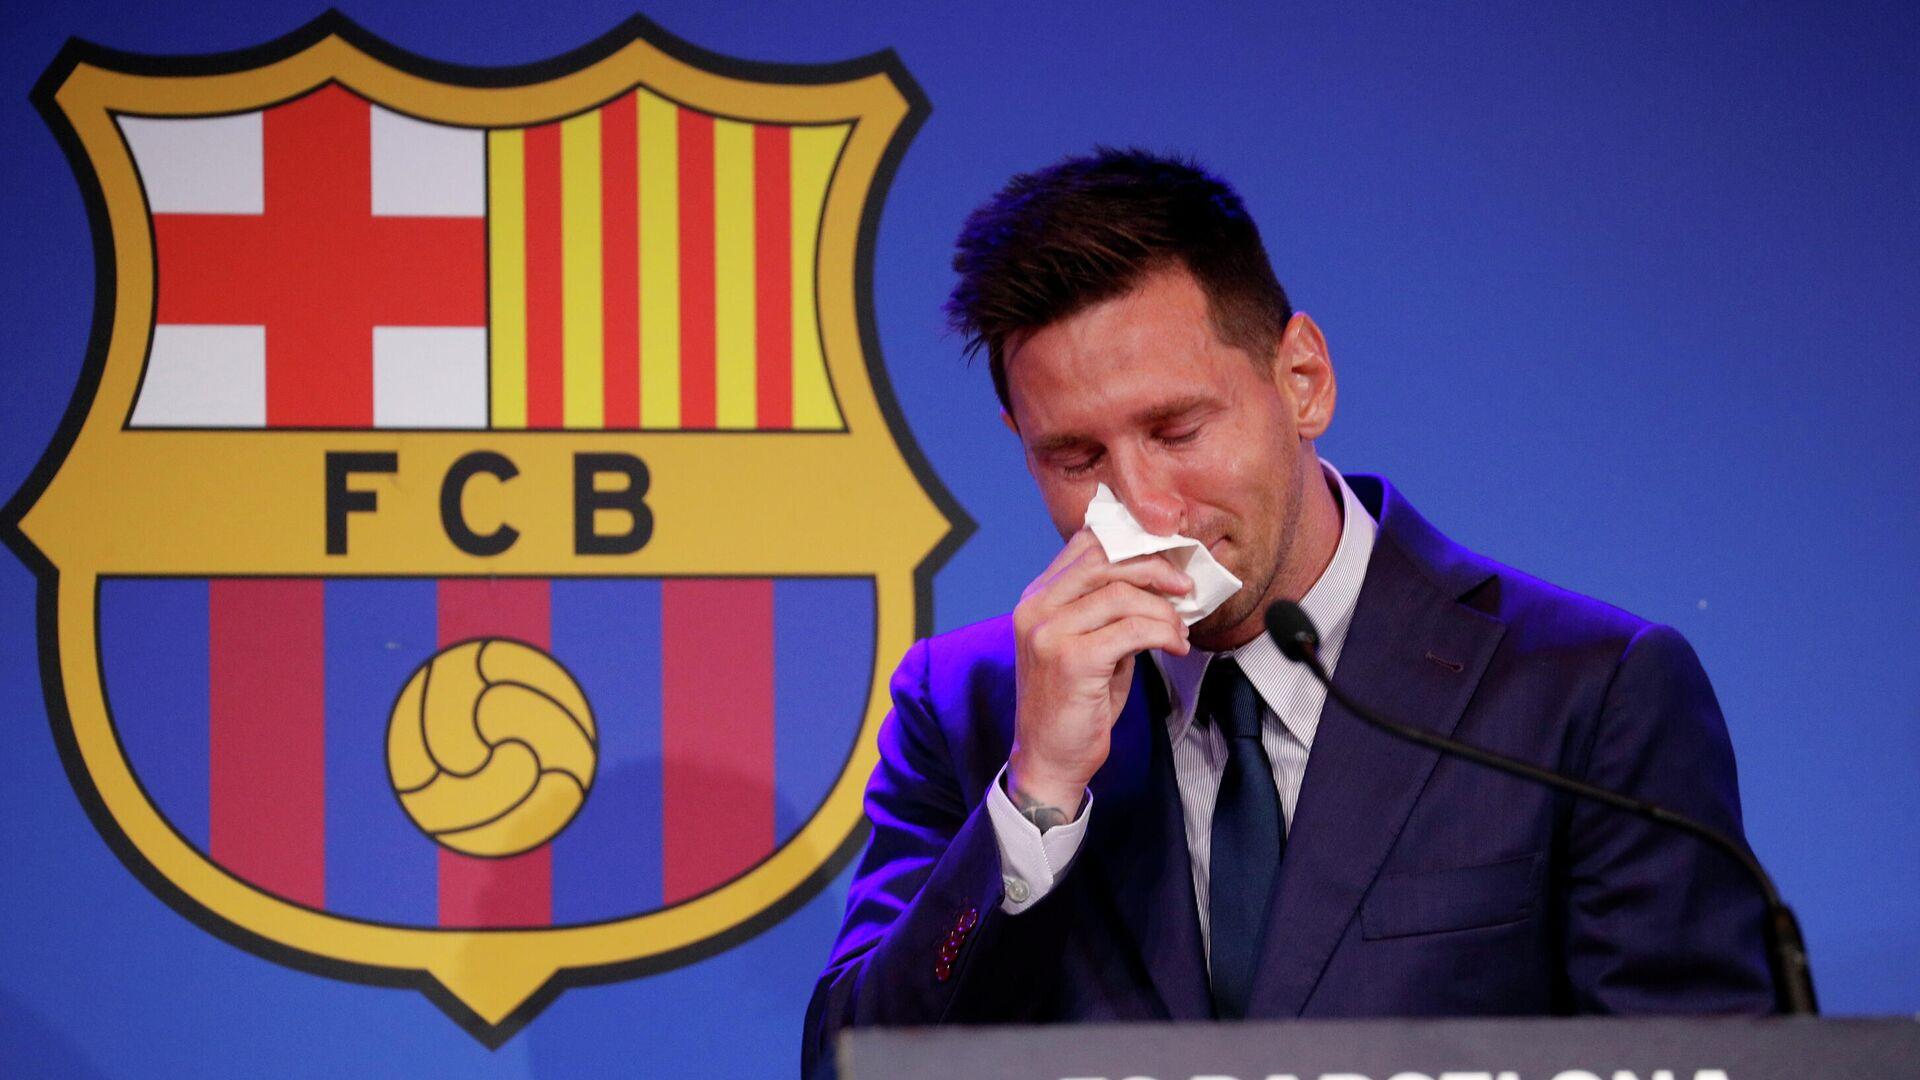 Messi rompe en llanto al dejar el Barcelona - Sputnik Mundo, 1920, 13.08.2021